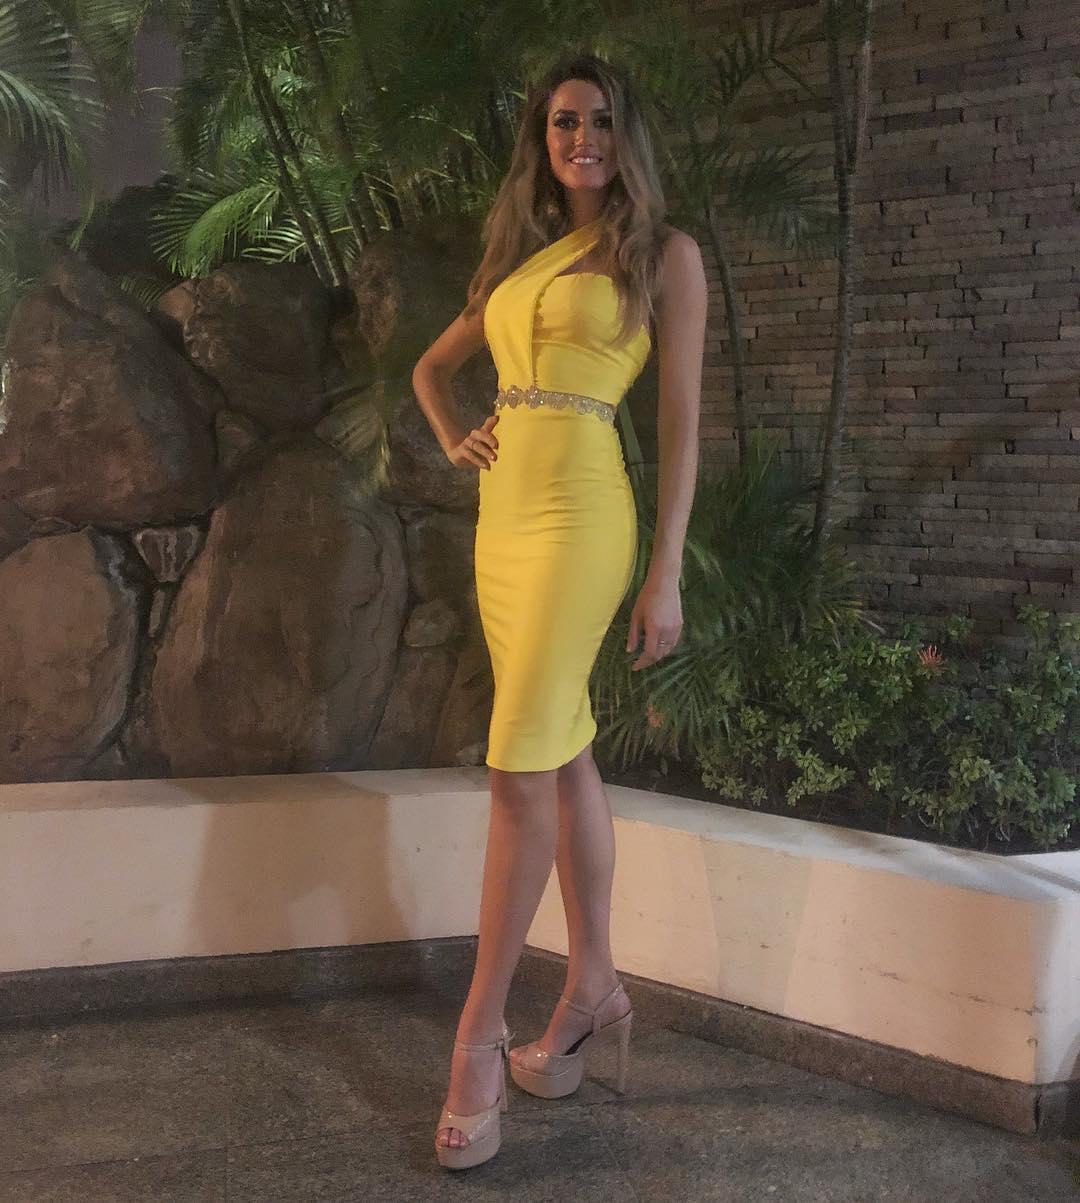 jessica mcfarlane, 7 finalista de reyna hispanoamericana 2018. - Página 3 44466910